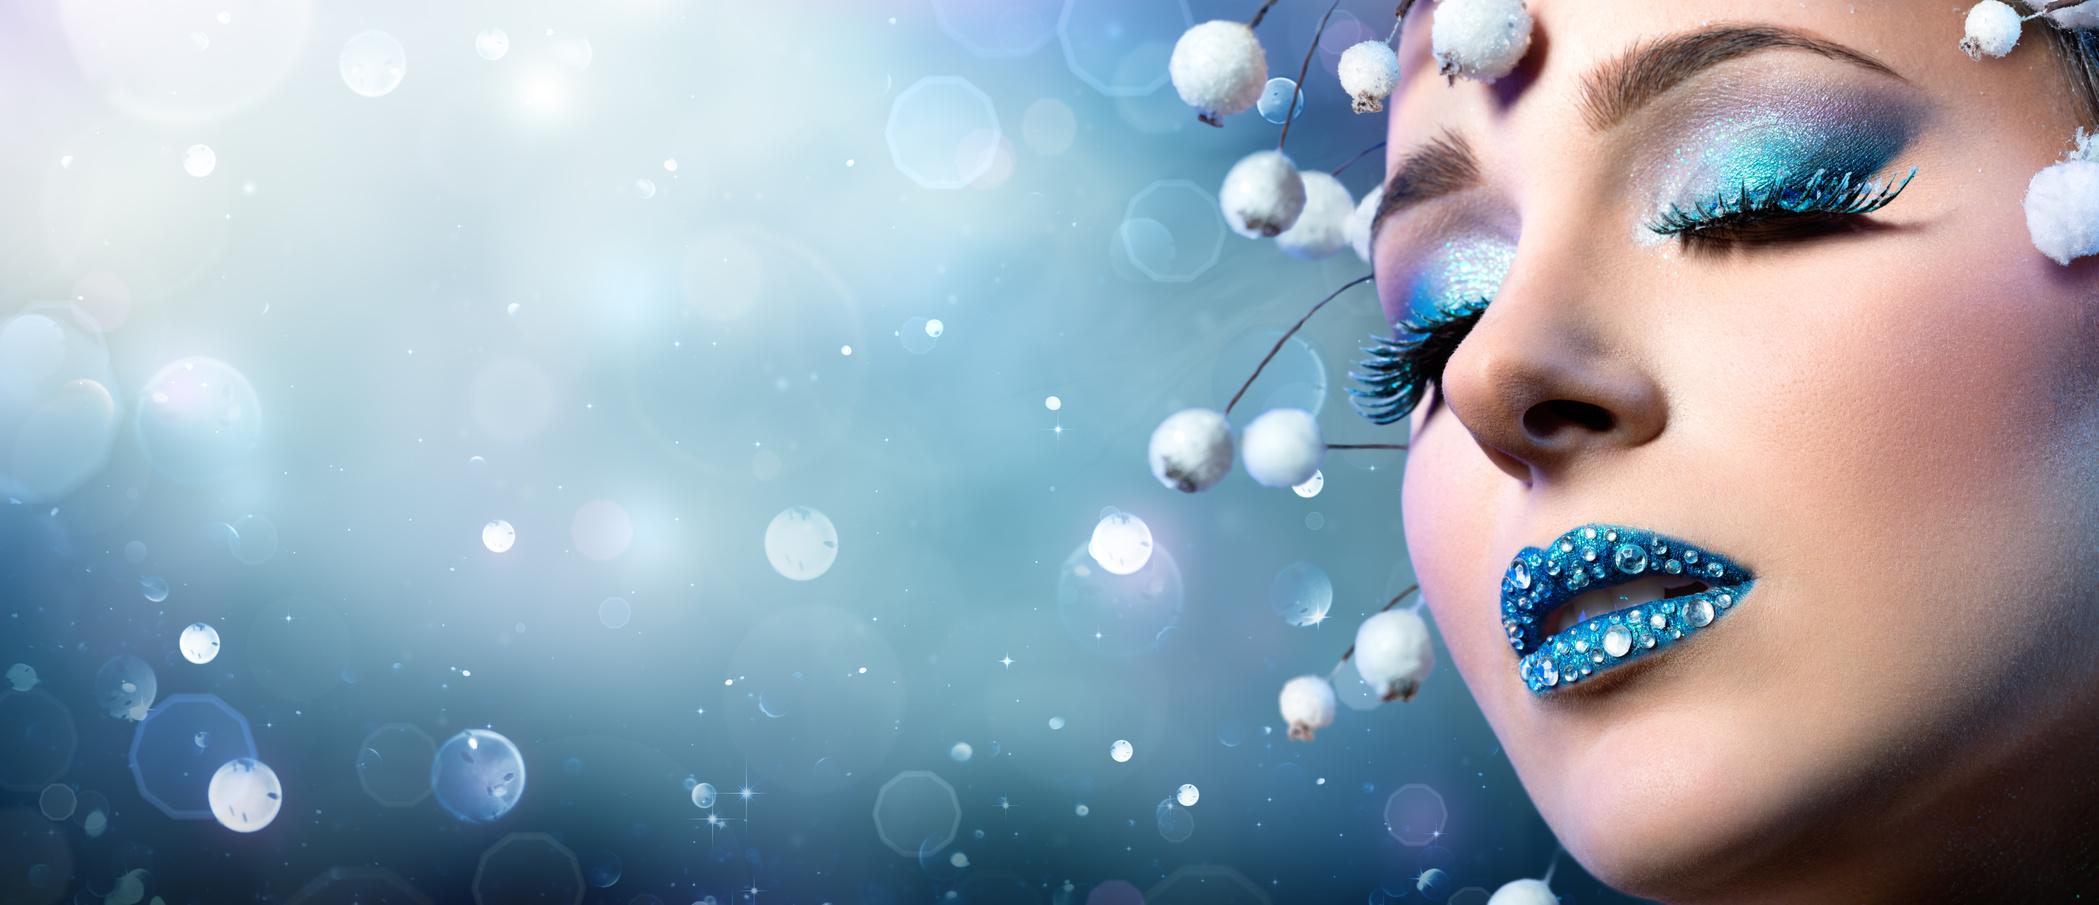 Professional makeup artist services Linden